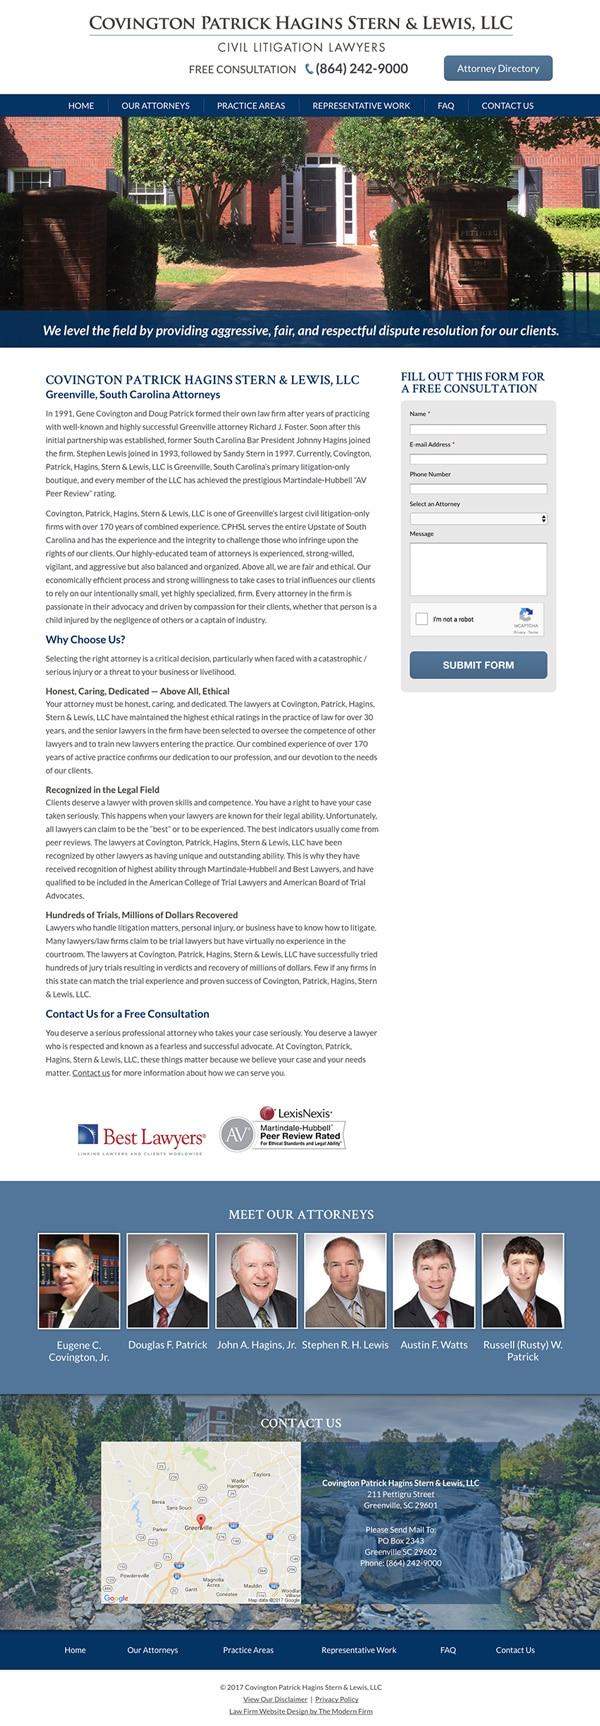 Law Firm Website Design for Covington Patrick Hagins Stern & Lewis, LLC